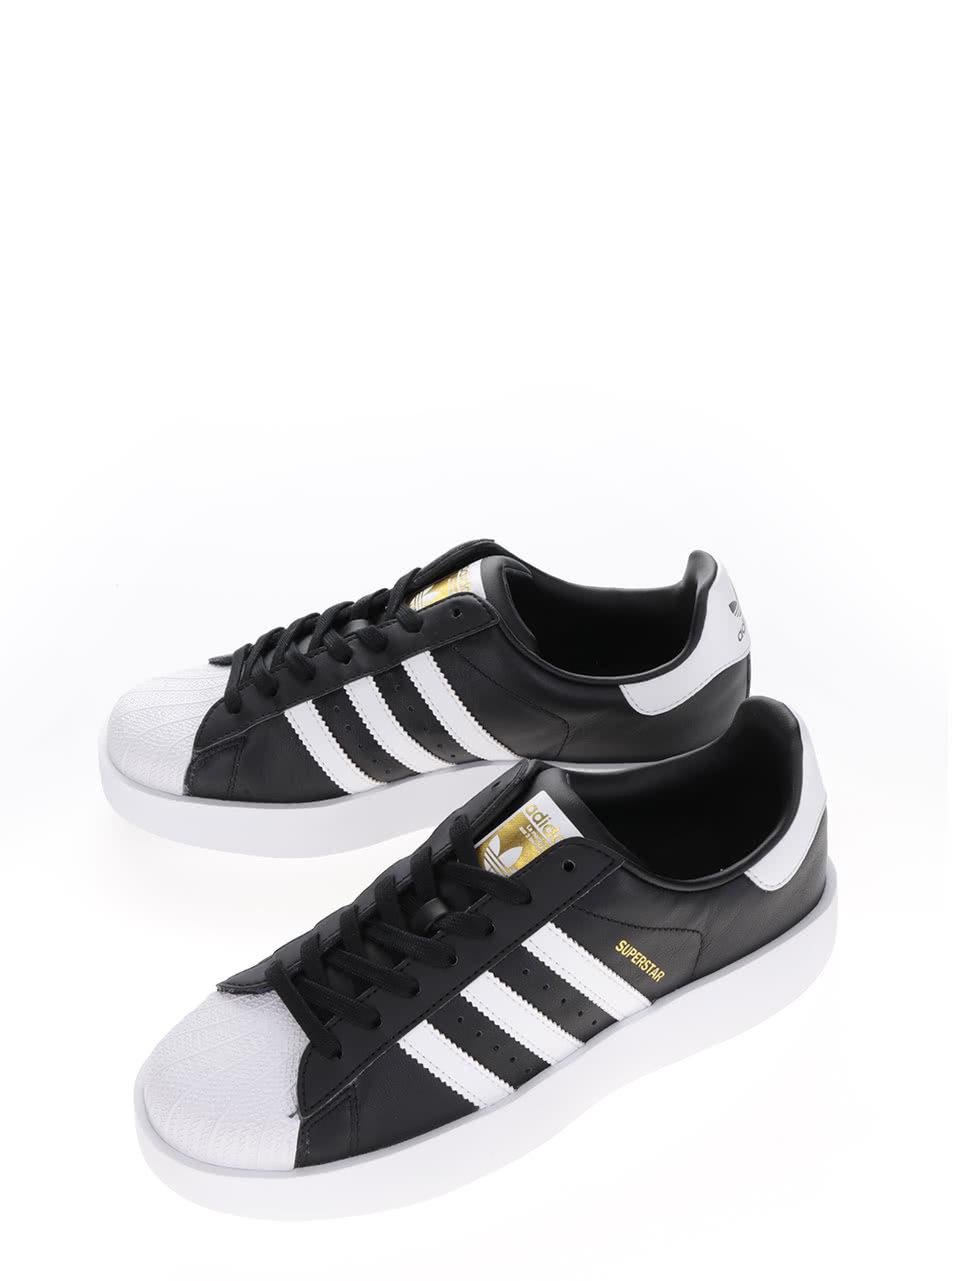 366f7a078c Čierne dámske kožené tenisky na platforme adidas Originals Superstar ...